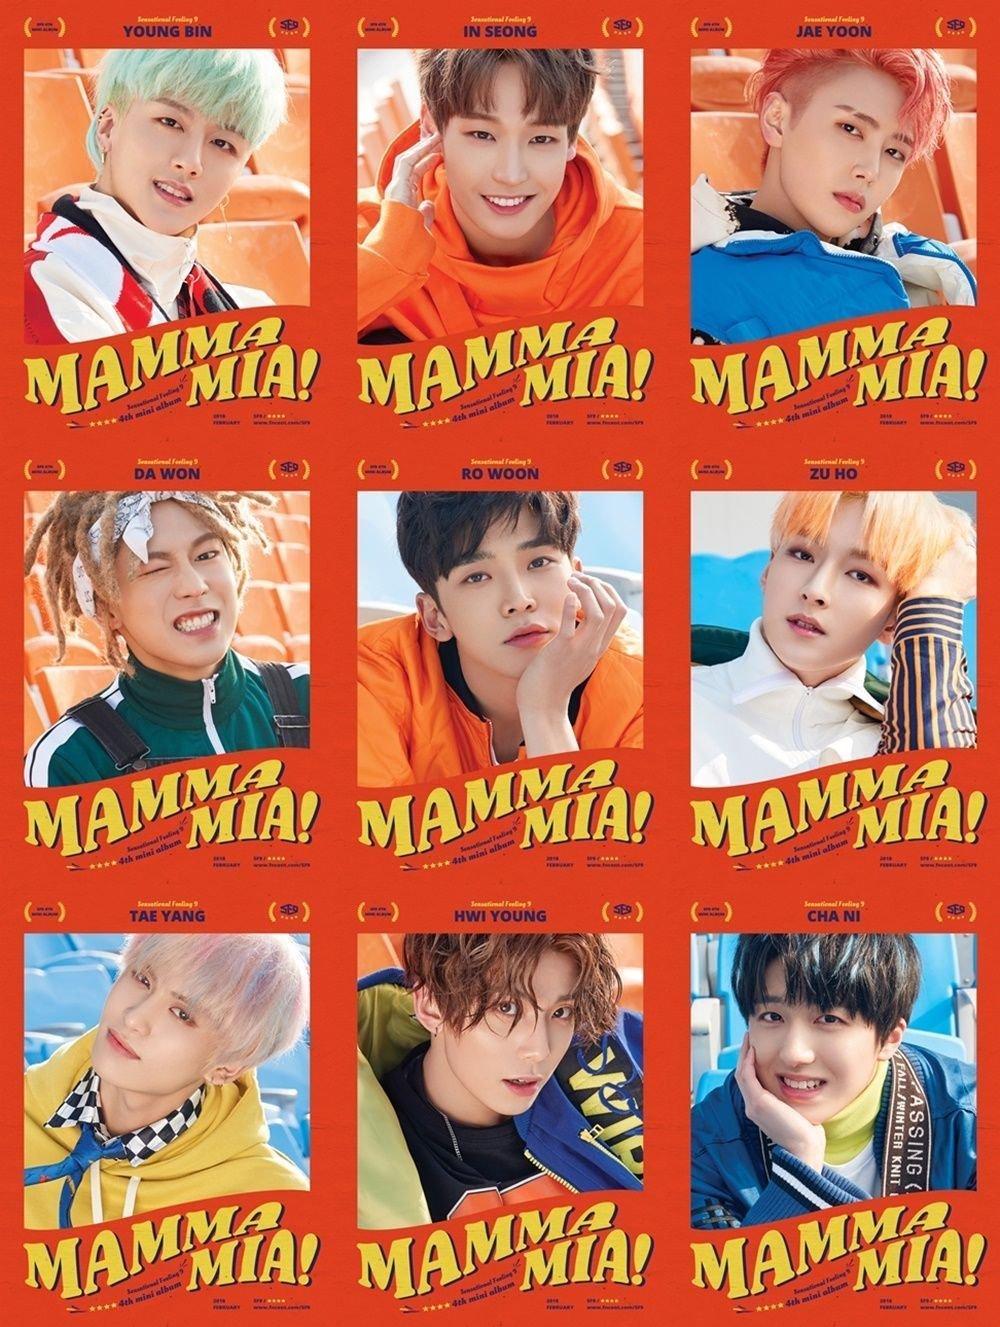 SF9 [MAMMA MIA!] 4th Mini Album CD+Photobook+Cover+Ticketcard+Card+Tracking Number SEALED